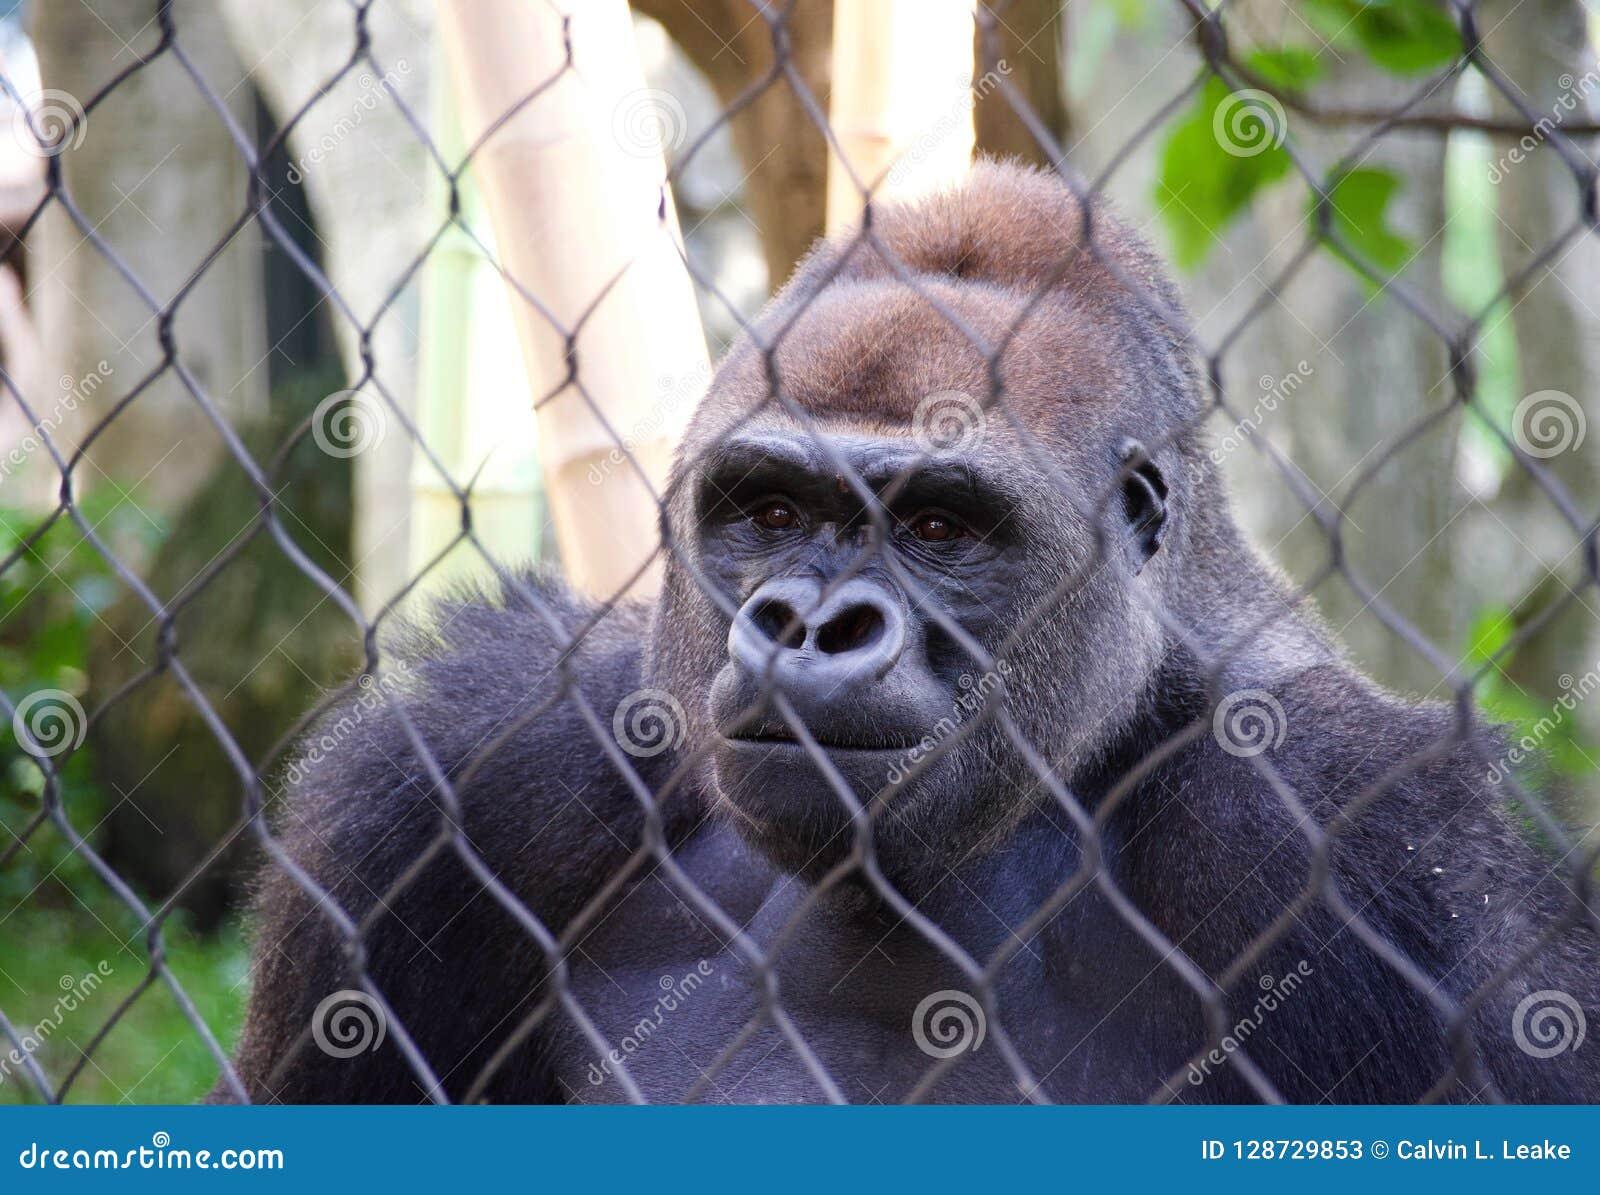 Gorila en cautiverio